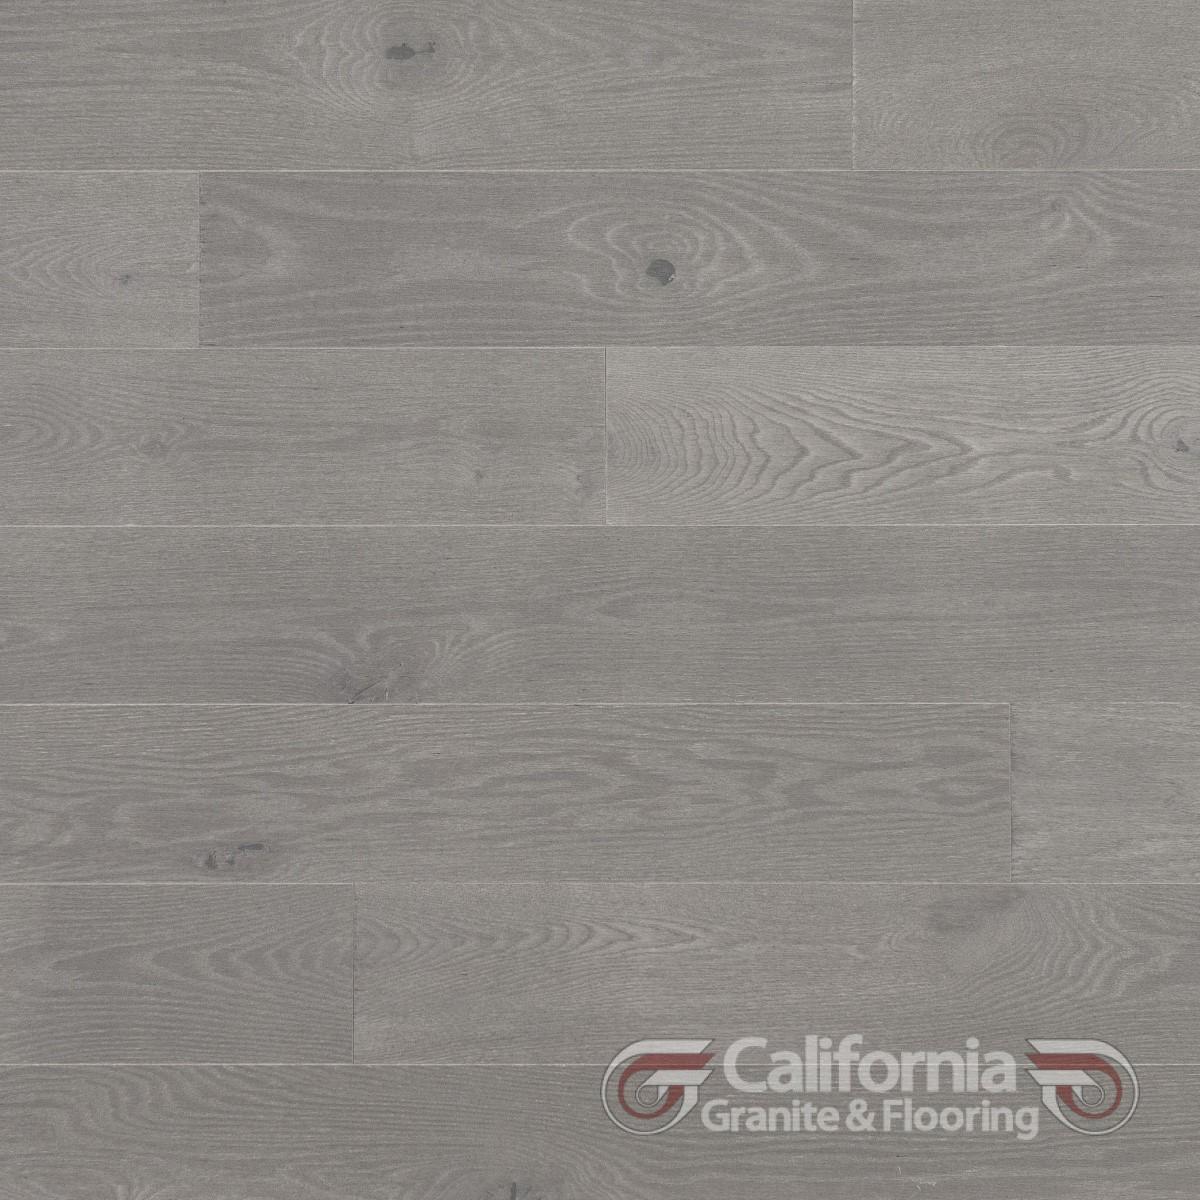 hardwood-flooring-red-oak-hopscotch-character-brushed-2